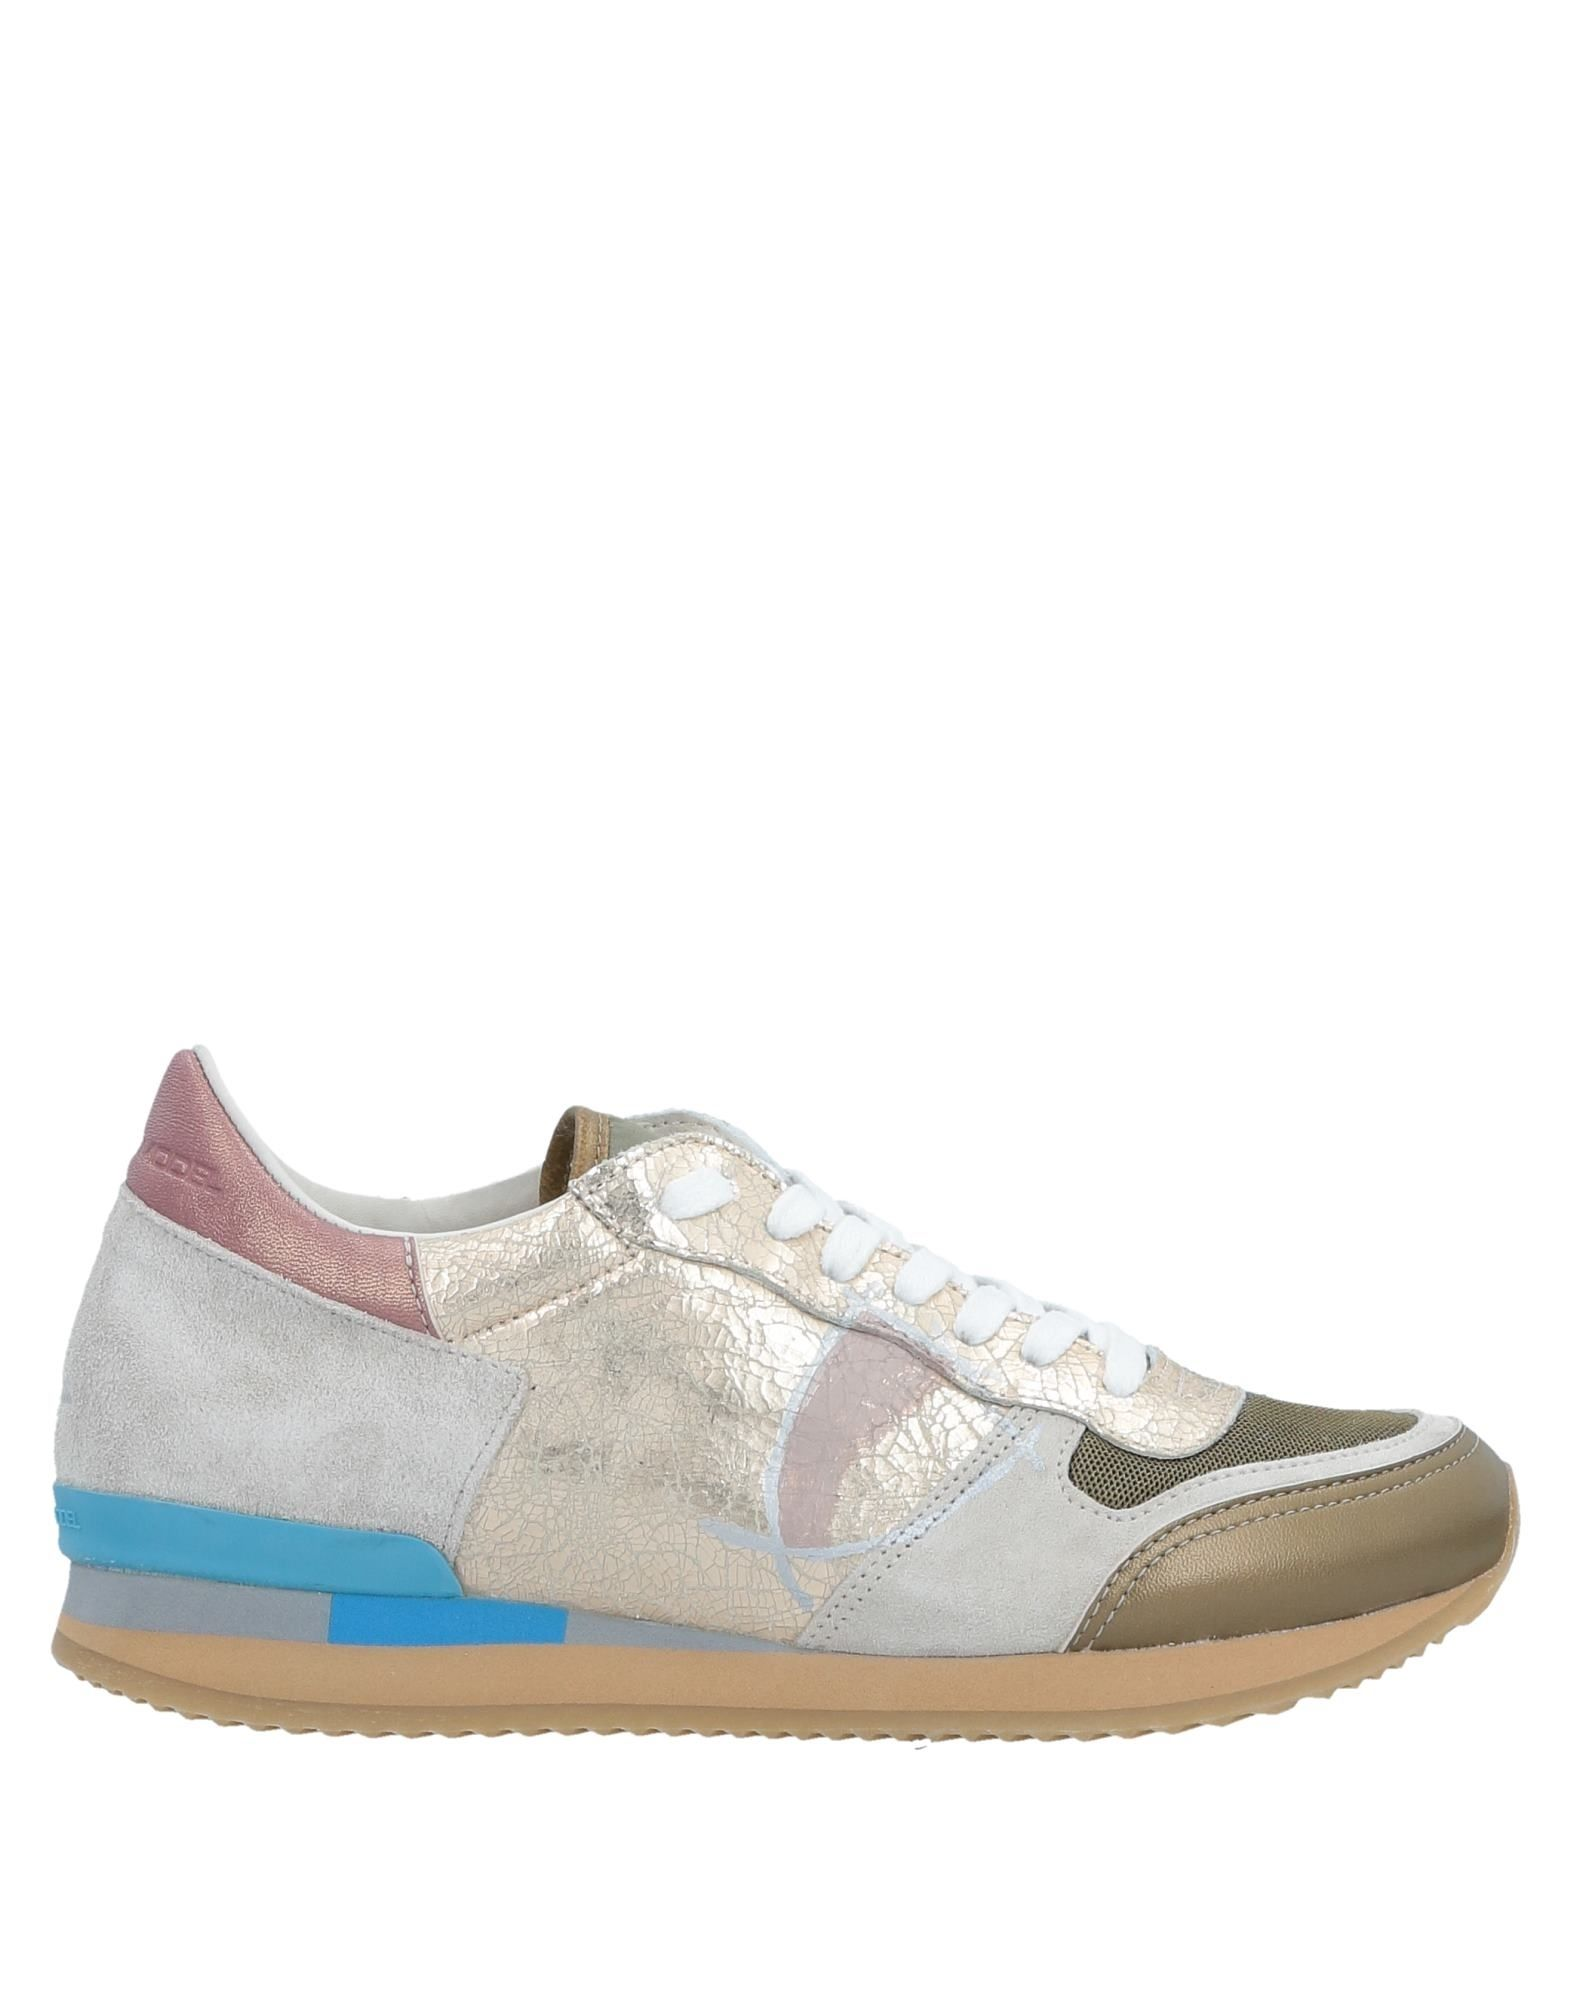 Hogan Sneakers Damen  11516738PEGut aussehende strapazierfähige Schuhe